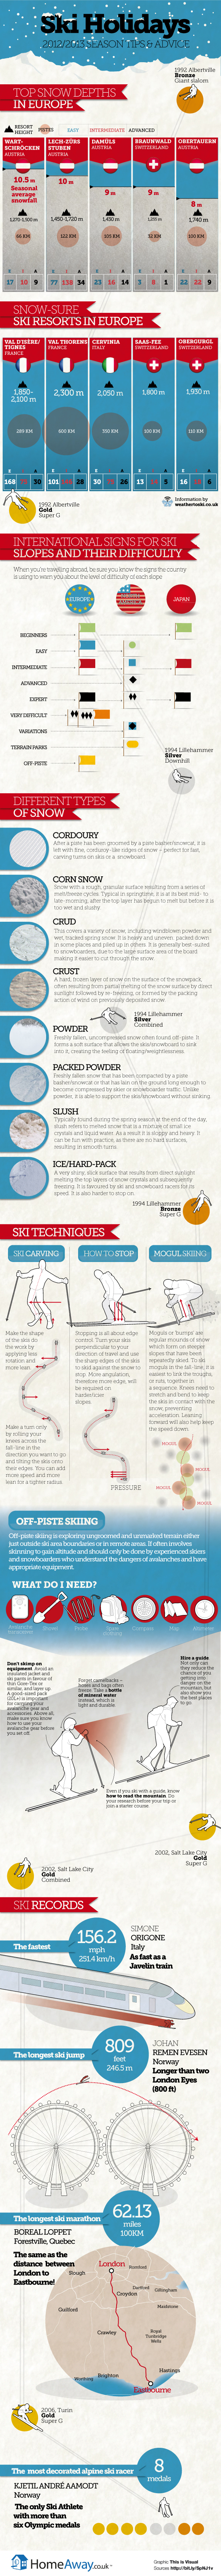 201213-ski-season-tips--advice_50c5df8b0ae45